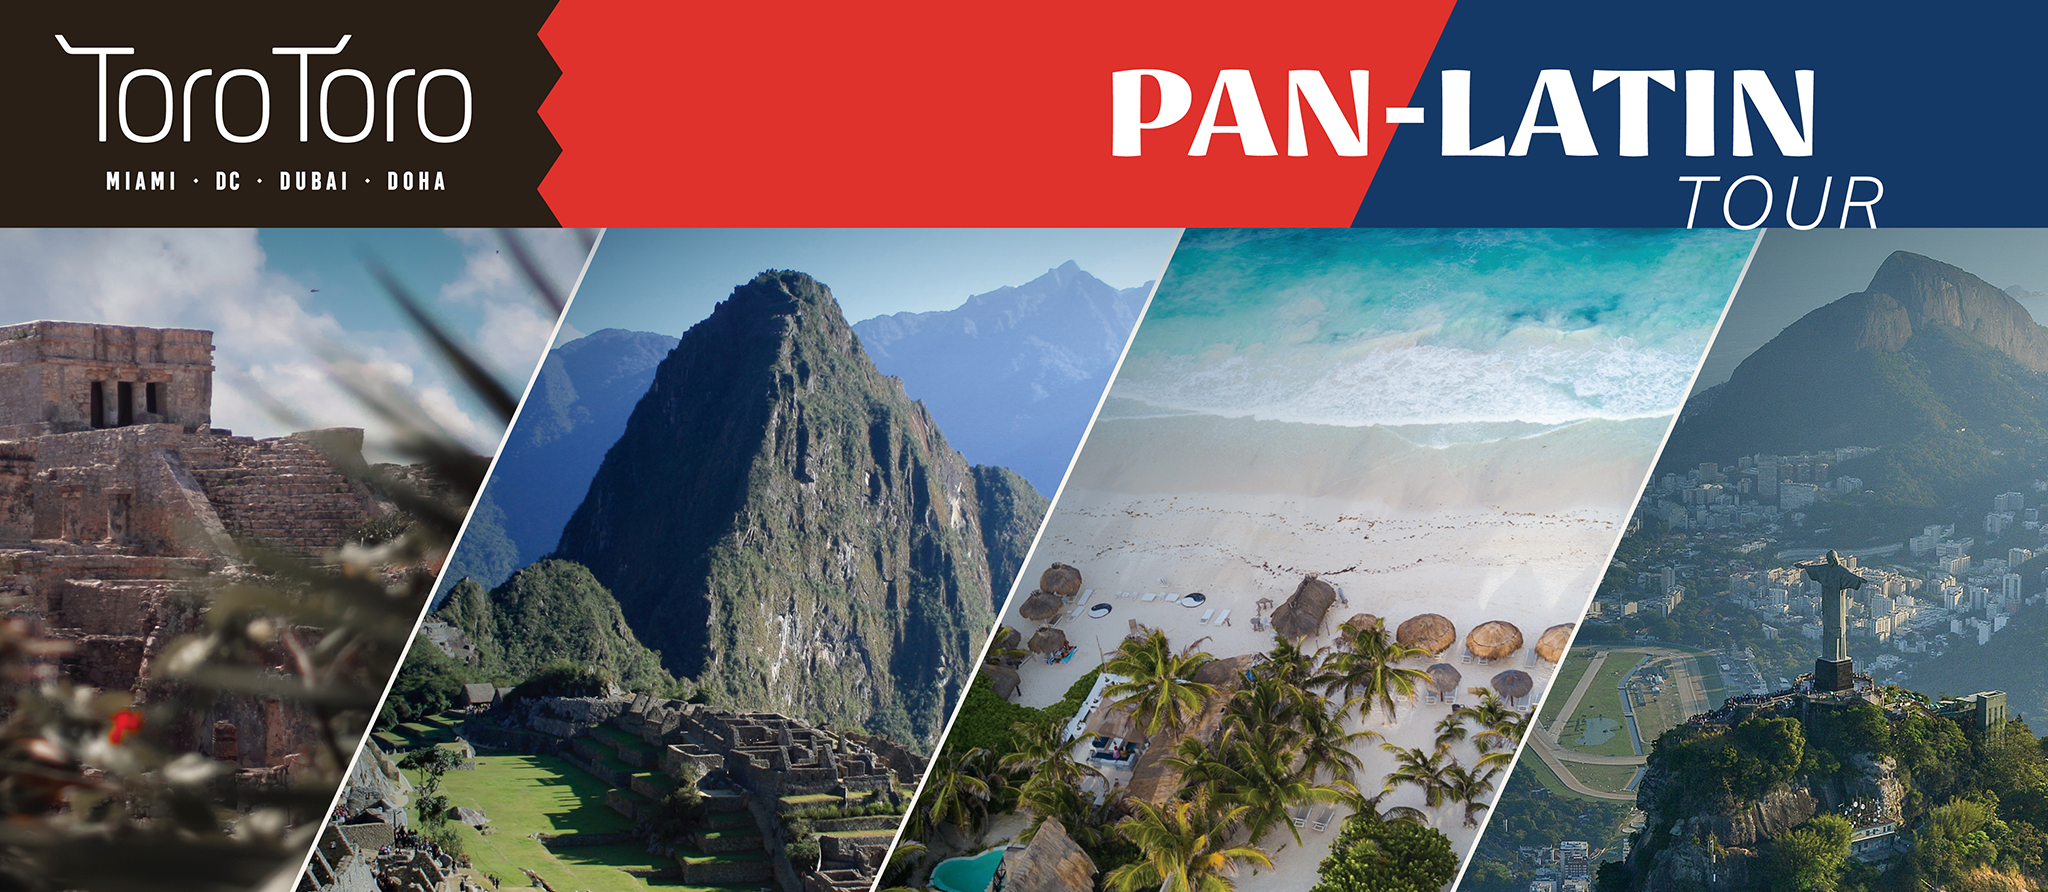 Toro Toro Pan-Latin Tour landscape photos and title graphic